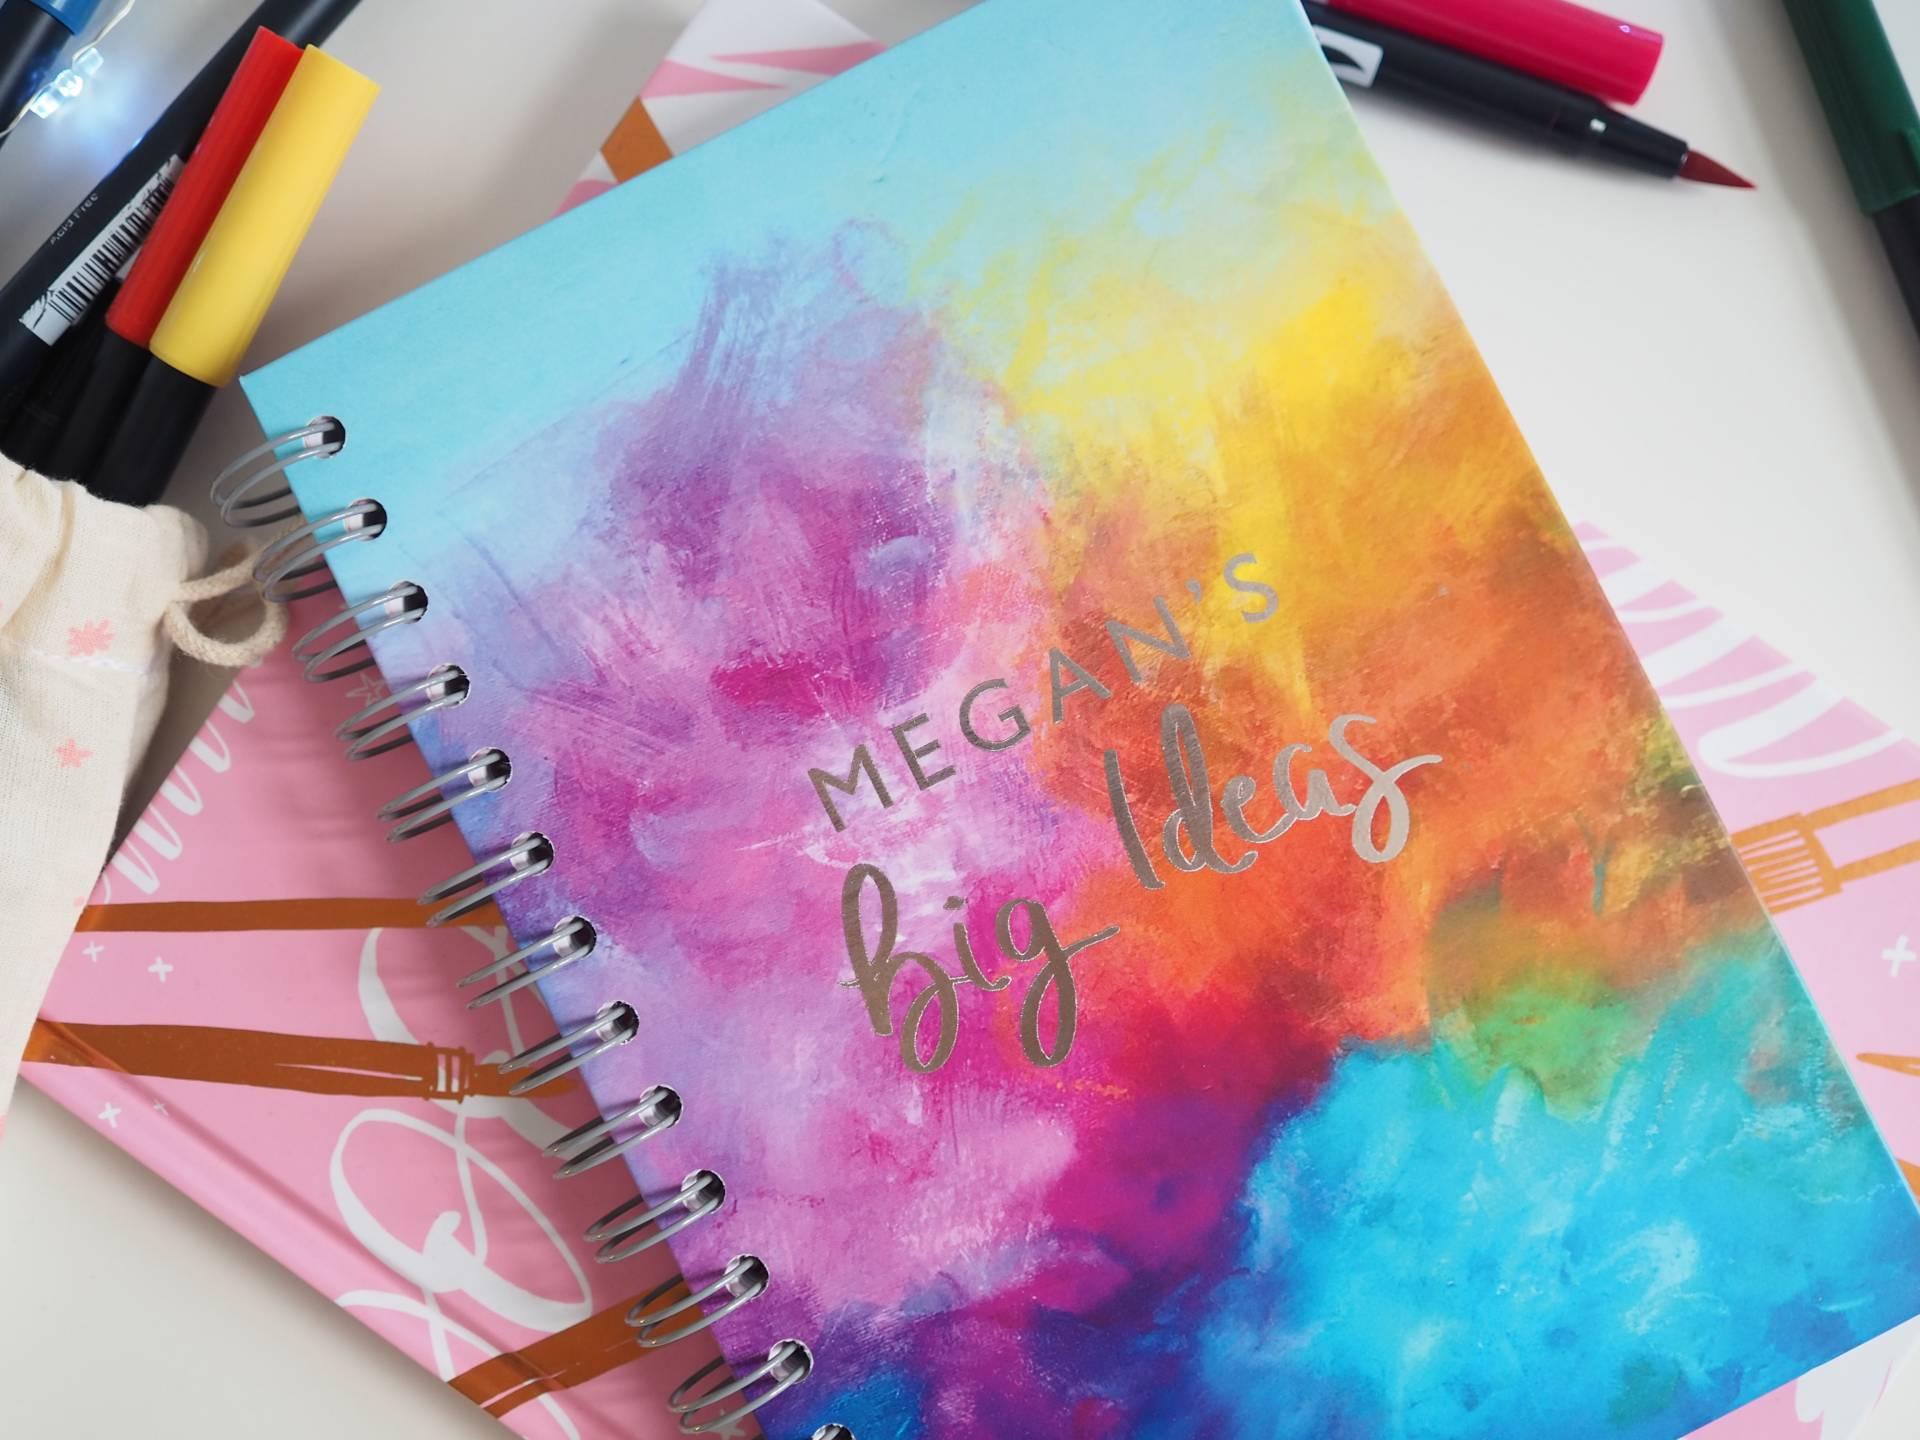 SPECIAL GIFT IDEAS | Megan Taylor